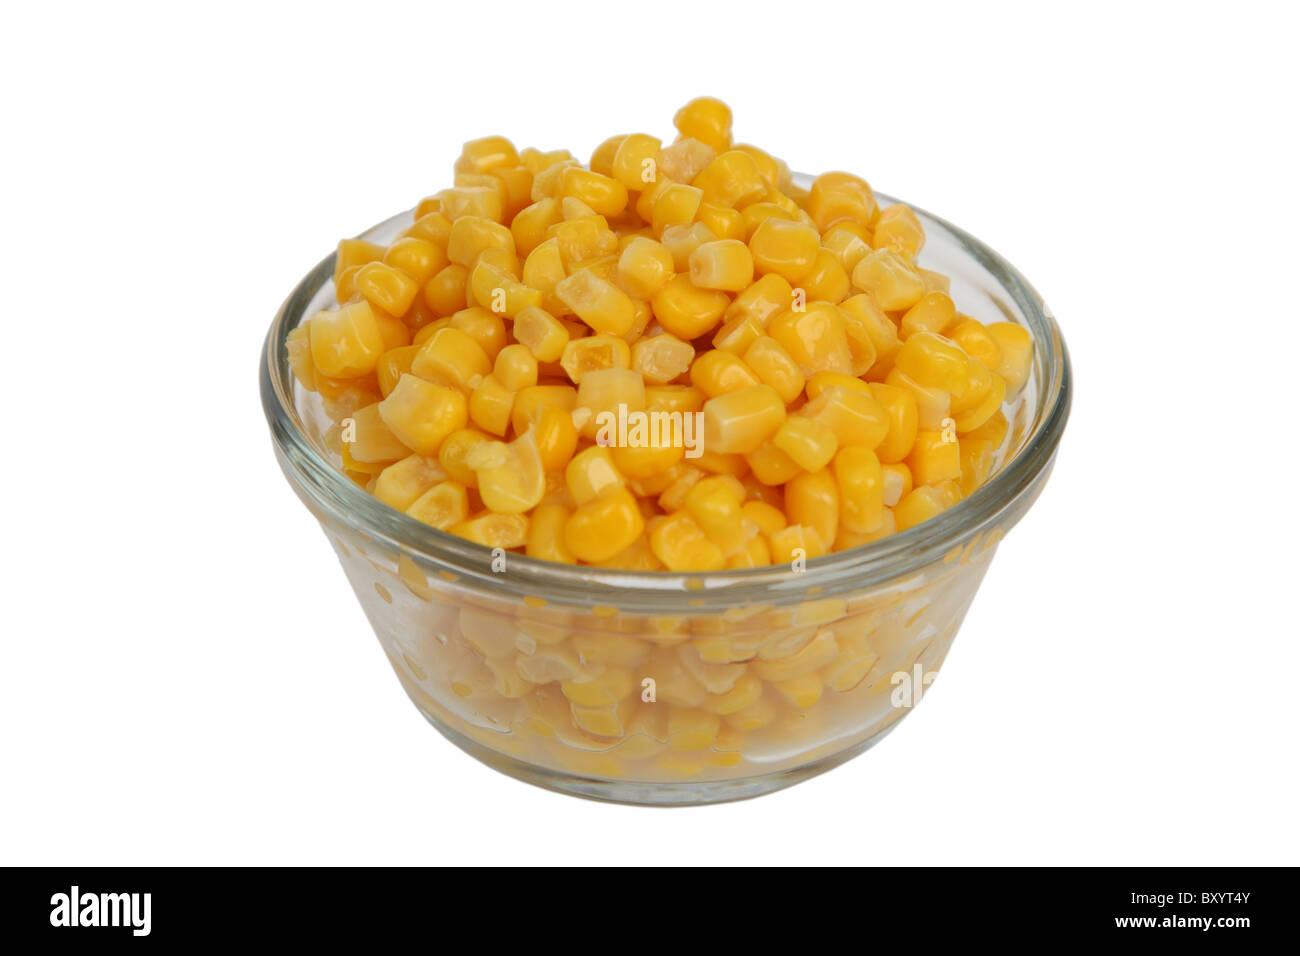 Bowl of corn on white background - Stock Image